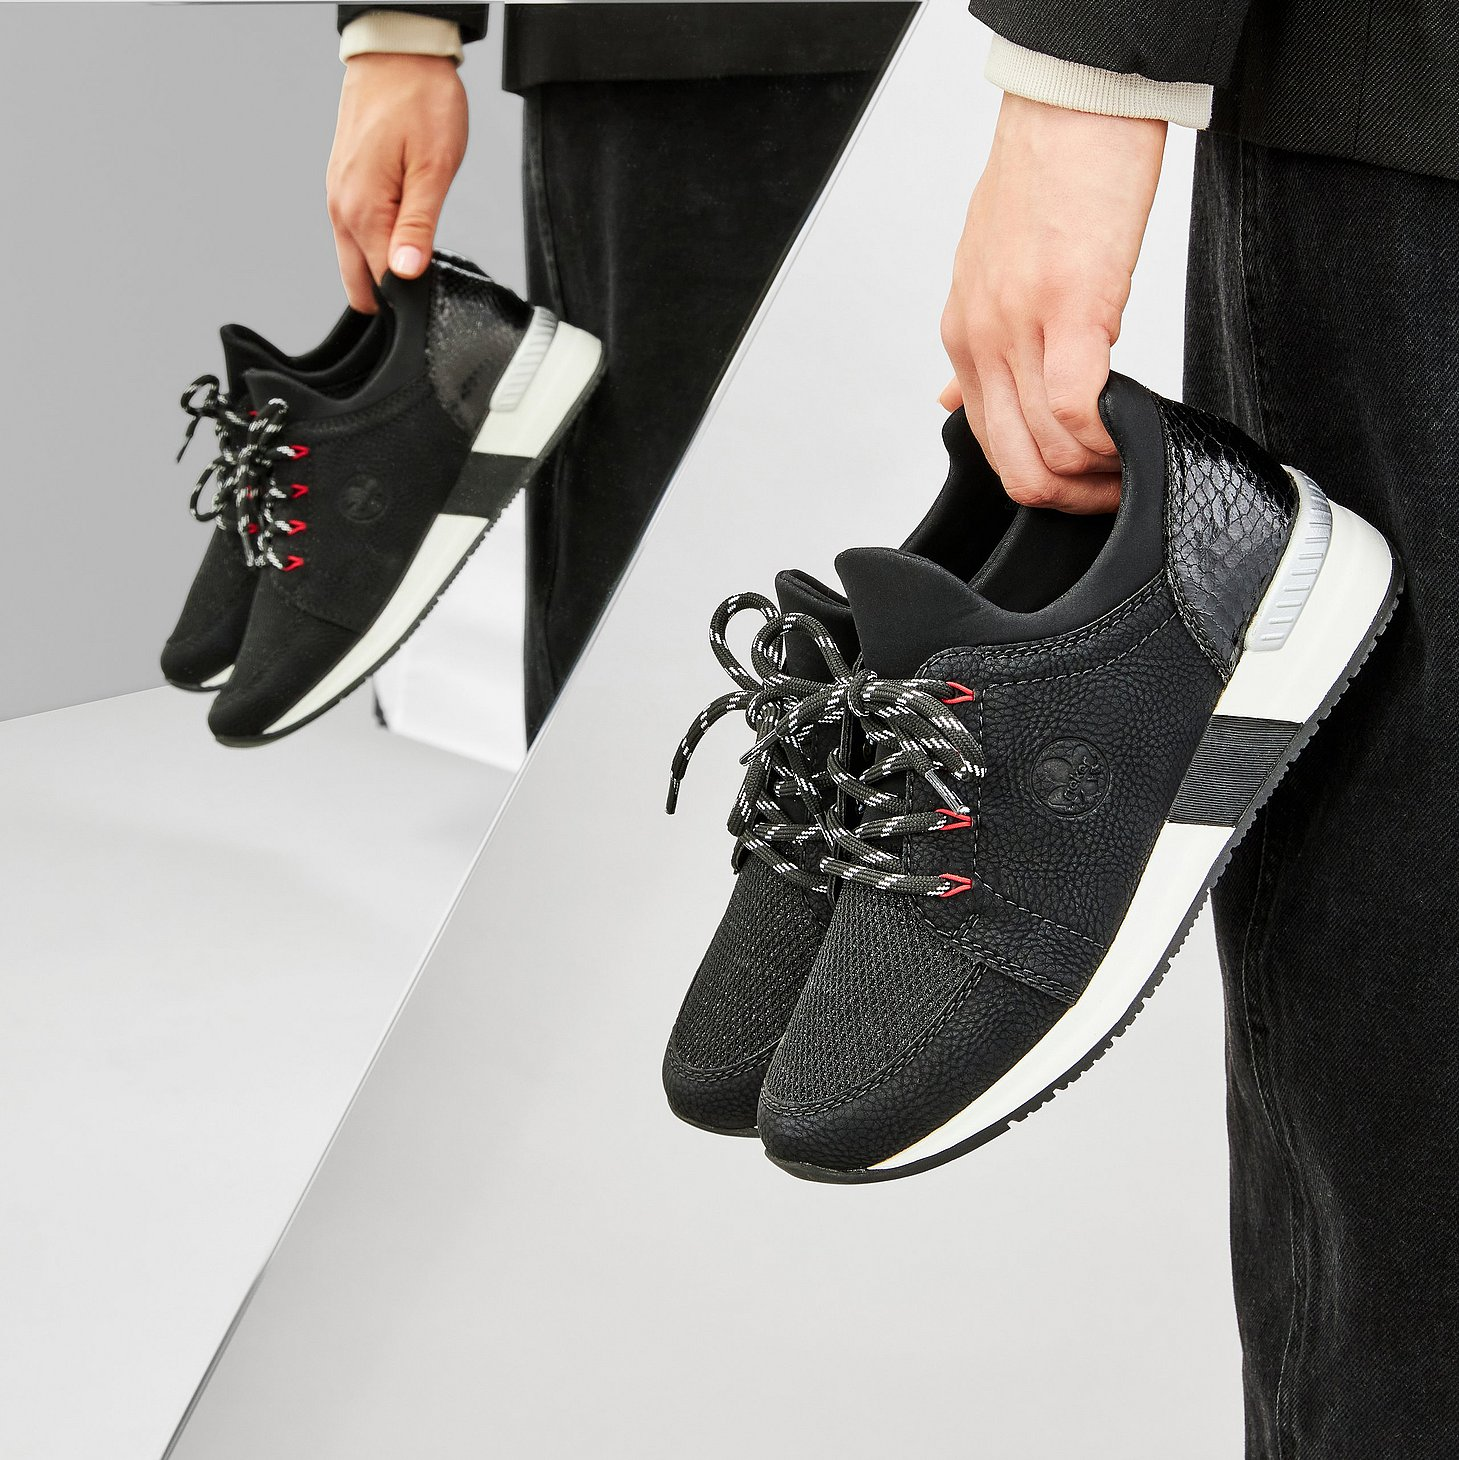 Rieker Antistress - Fashionable shoes